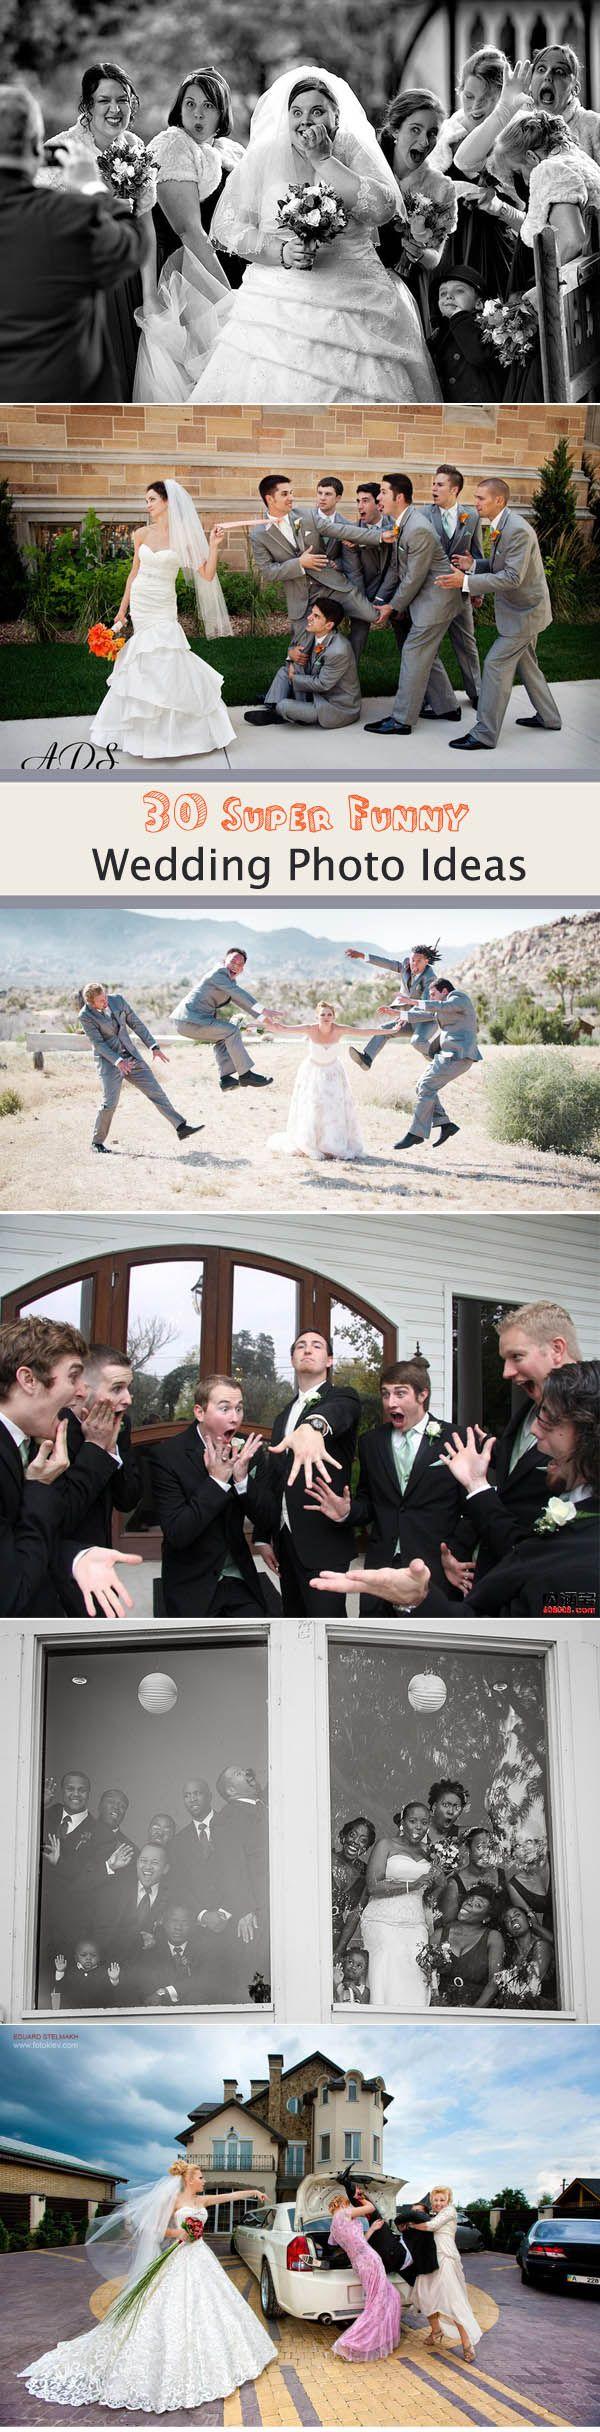 Hochzeitsfotos mal anders - sehr tolle Ideen!